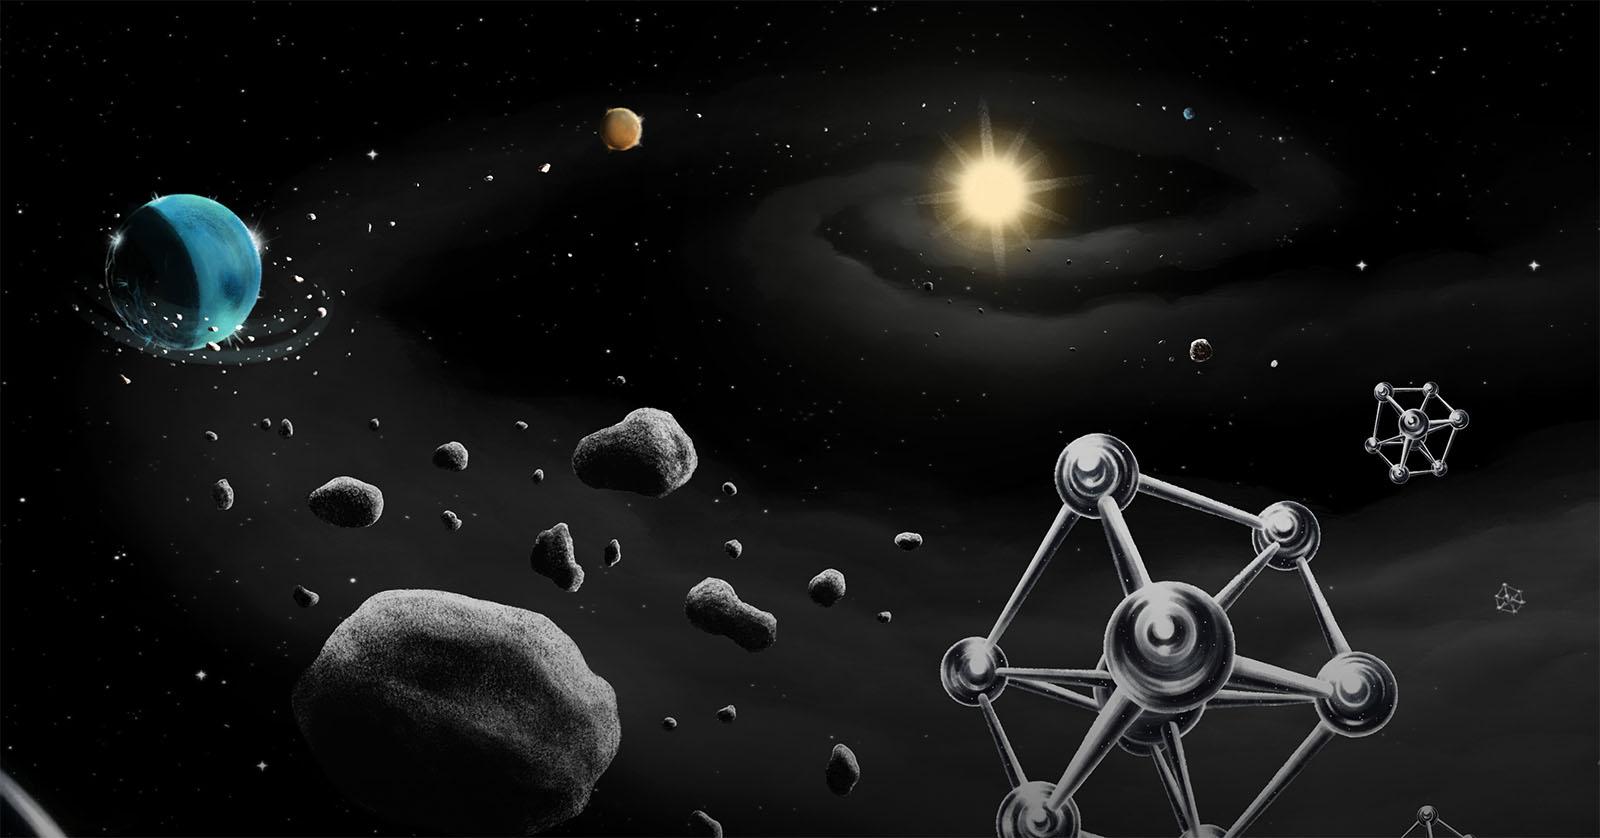 Artigo na Science: Rocky exoplanets and their host stars